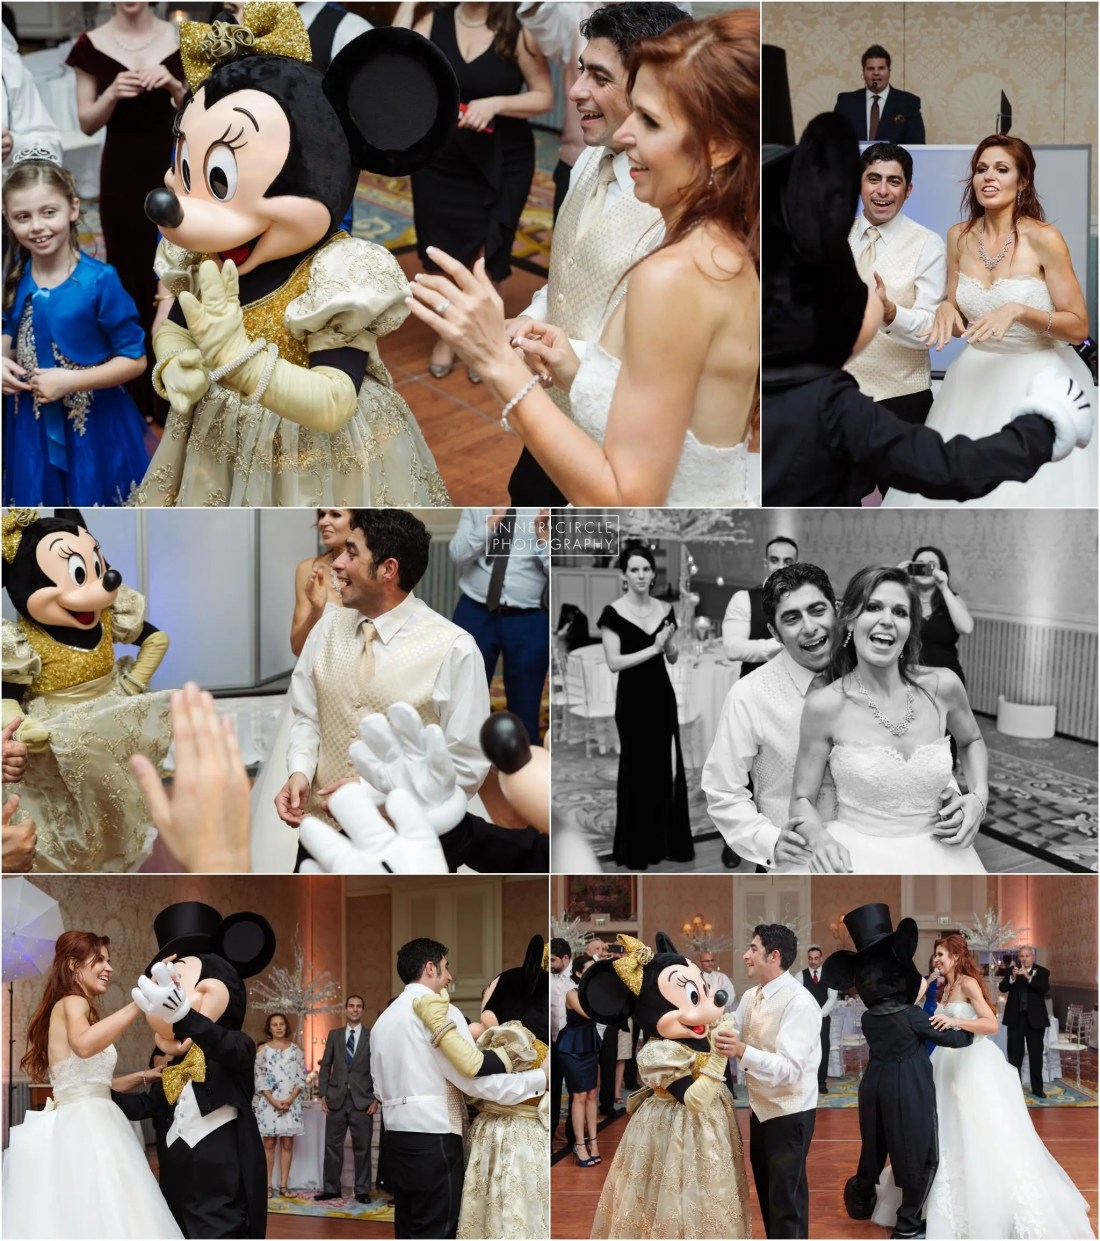 JasonShannon_DisneyWorld_WED18_InnerCirclePhoto_368 Jason+Shannon :: MARRIED!